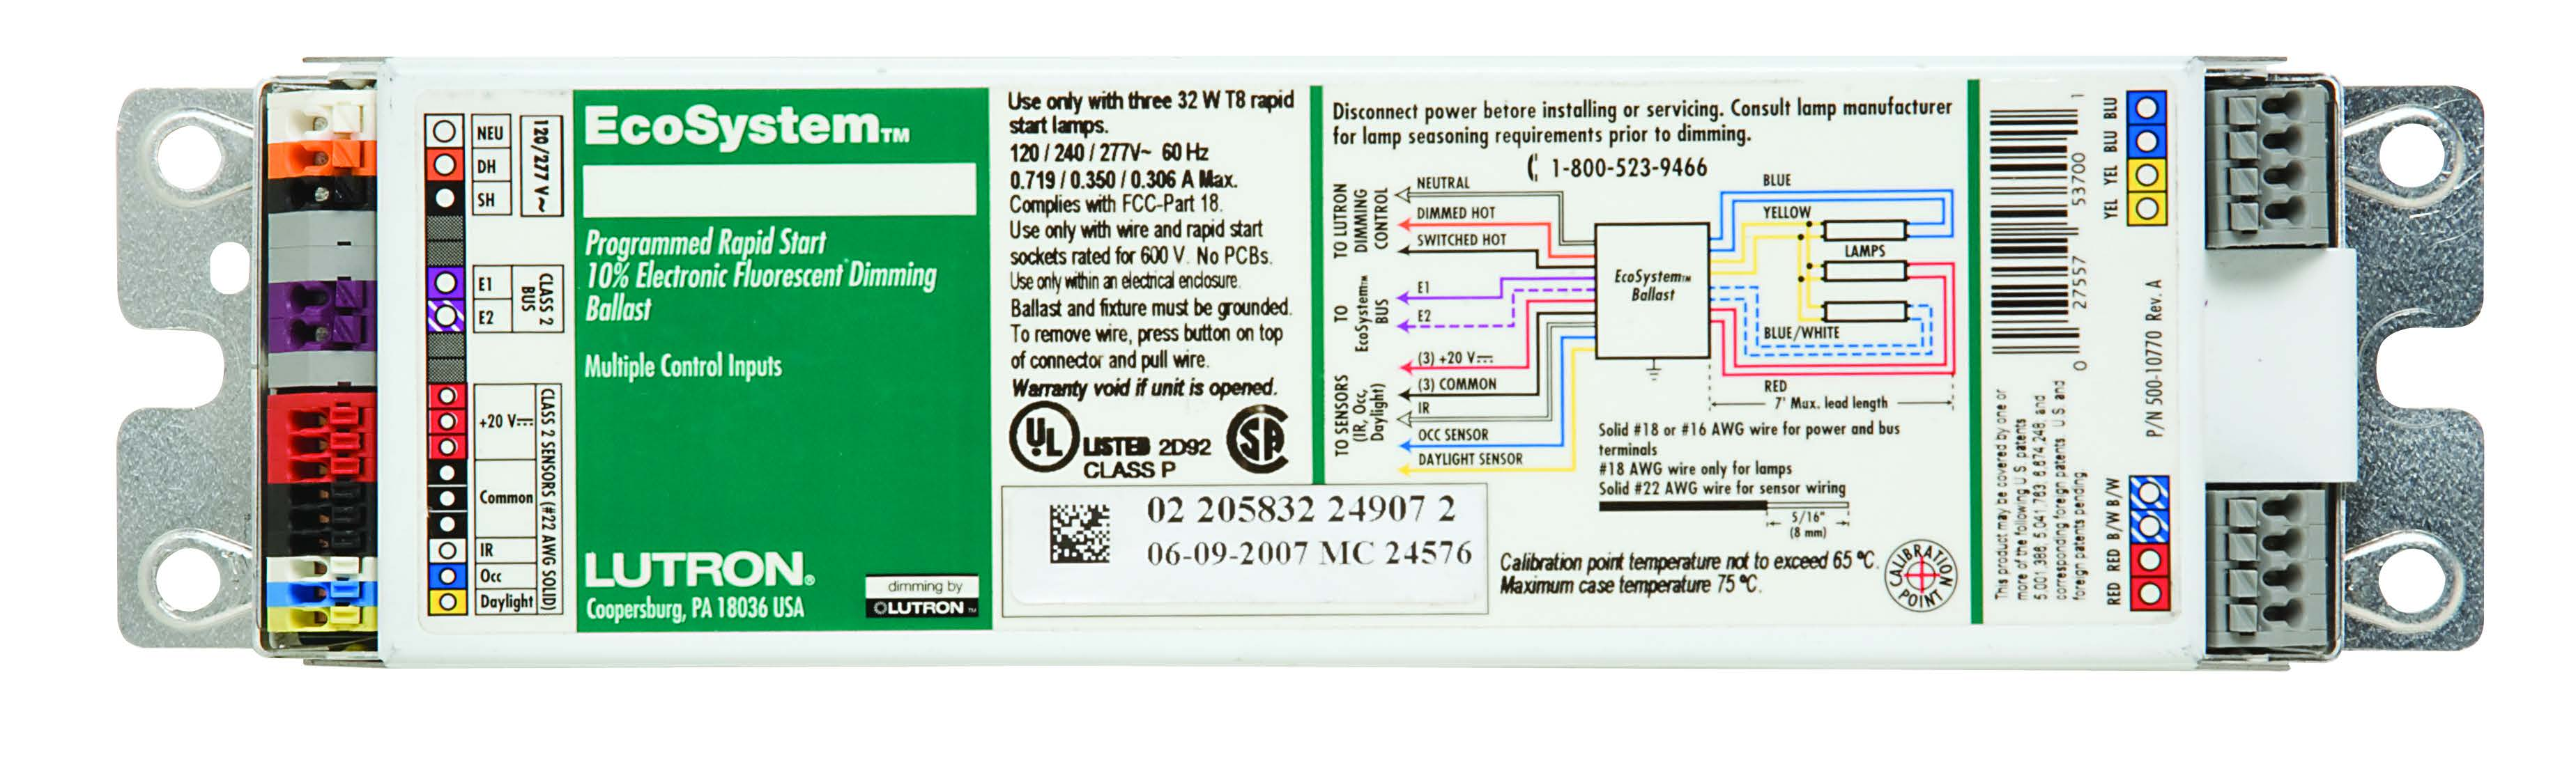 lutron ecosystem ballast wiring diagram ec5t832gunv3l lutron ecosys ballast 5 input t8 32w gunv 3 lamp  ecosys ballast 5 input t8 32w gunv 3 lamp